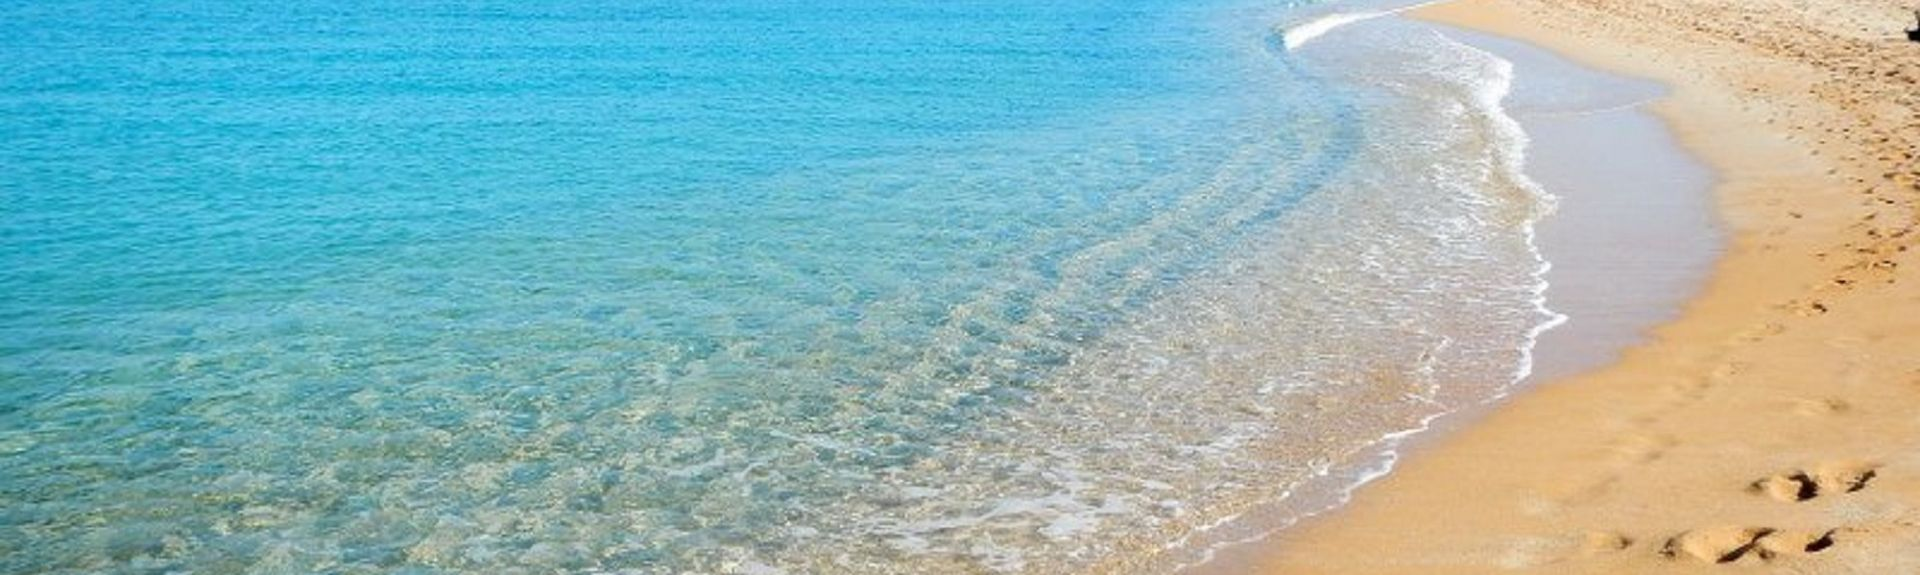 Plaża Scivu, Arbus, Sardynia, Włochy